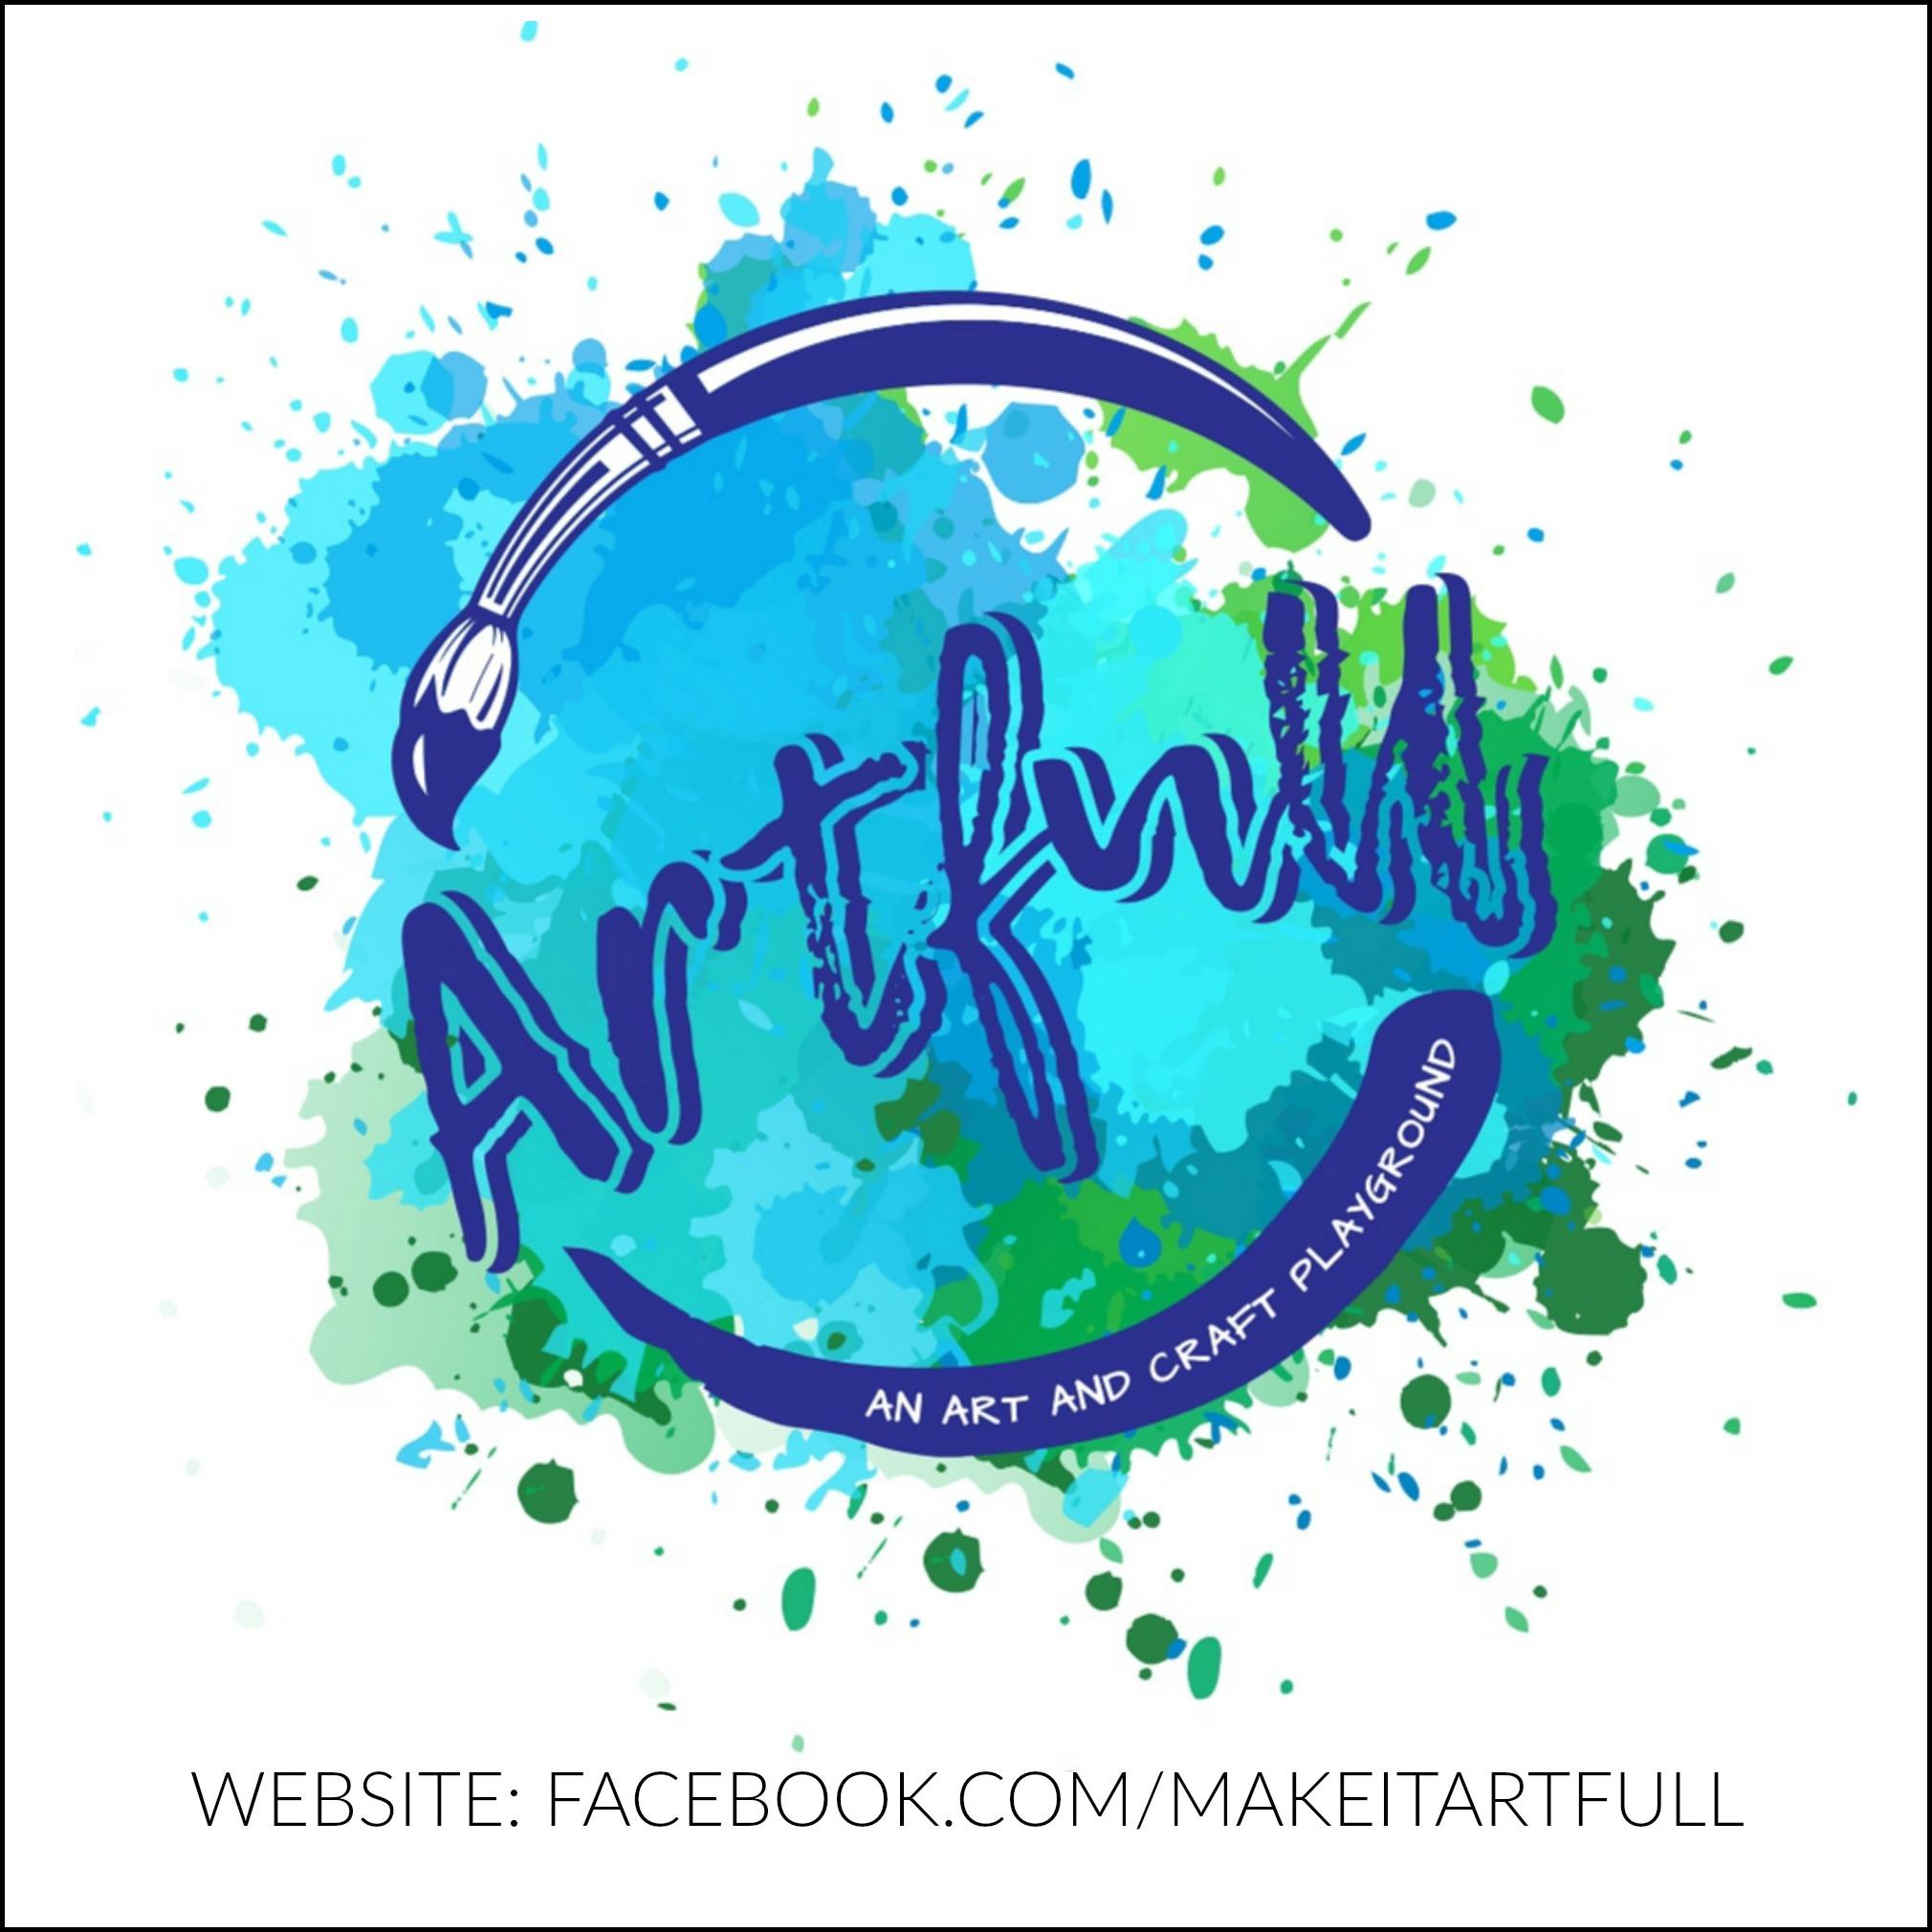 Artfull, an art and craft playground | FACEBOOK.COM/MAKEITARTFULL